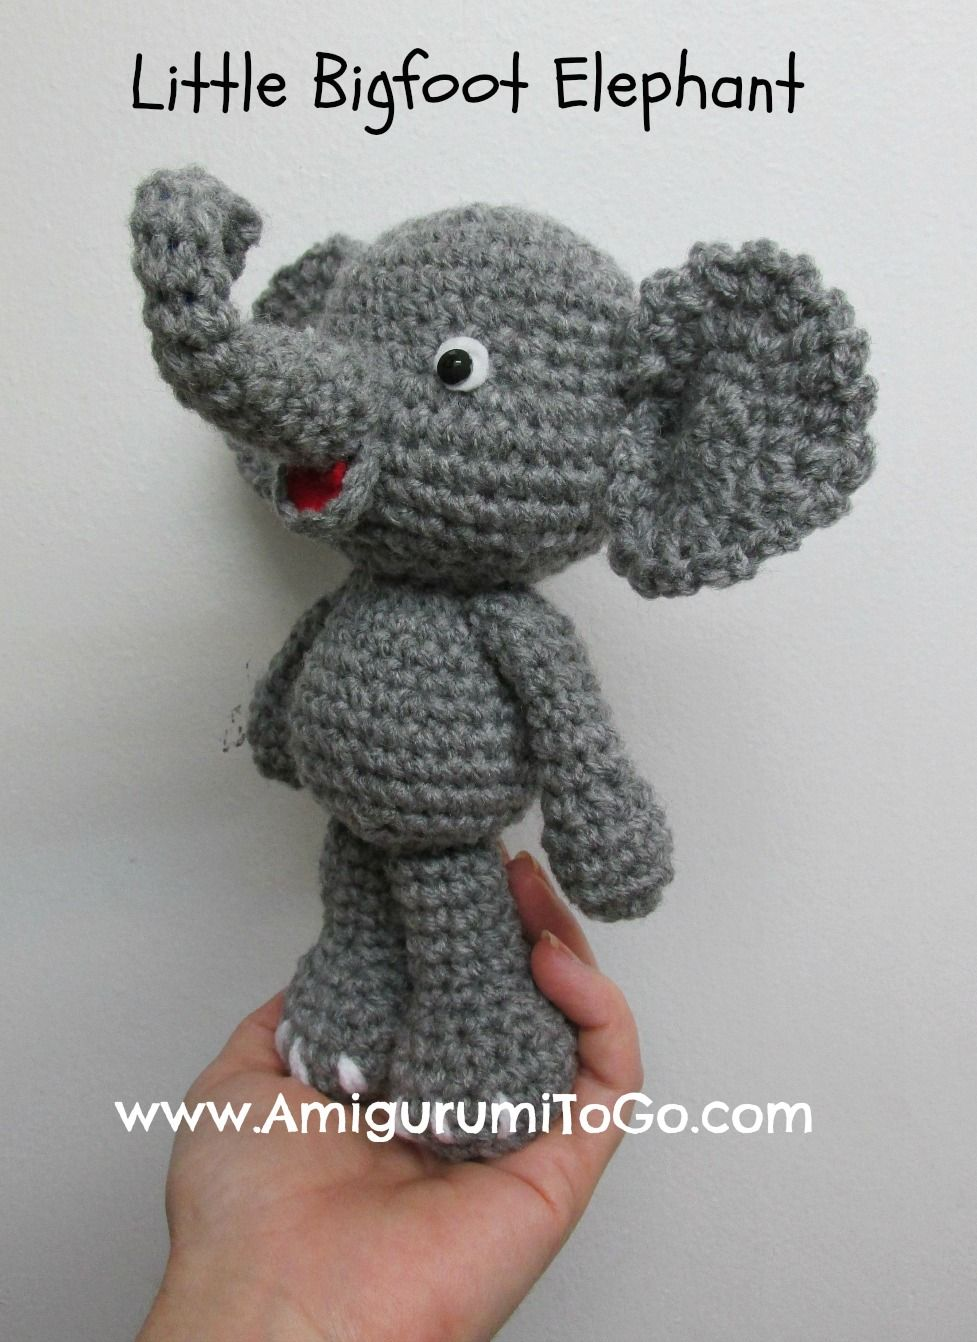 Amigurumi To Go Lion : Crochet Elephant Pattern on Pinterest